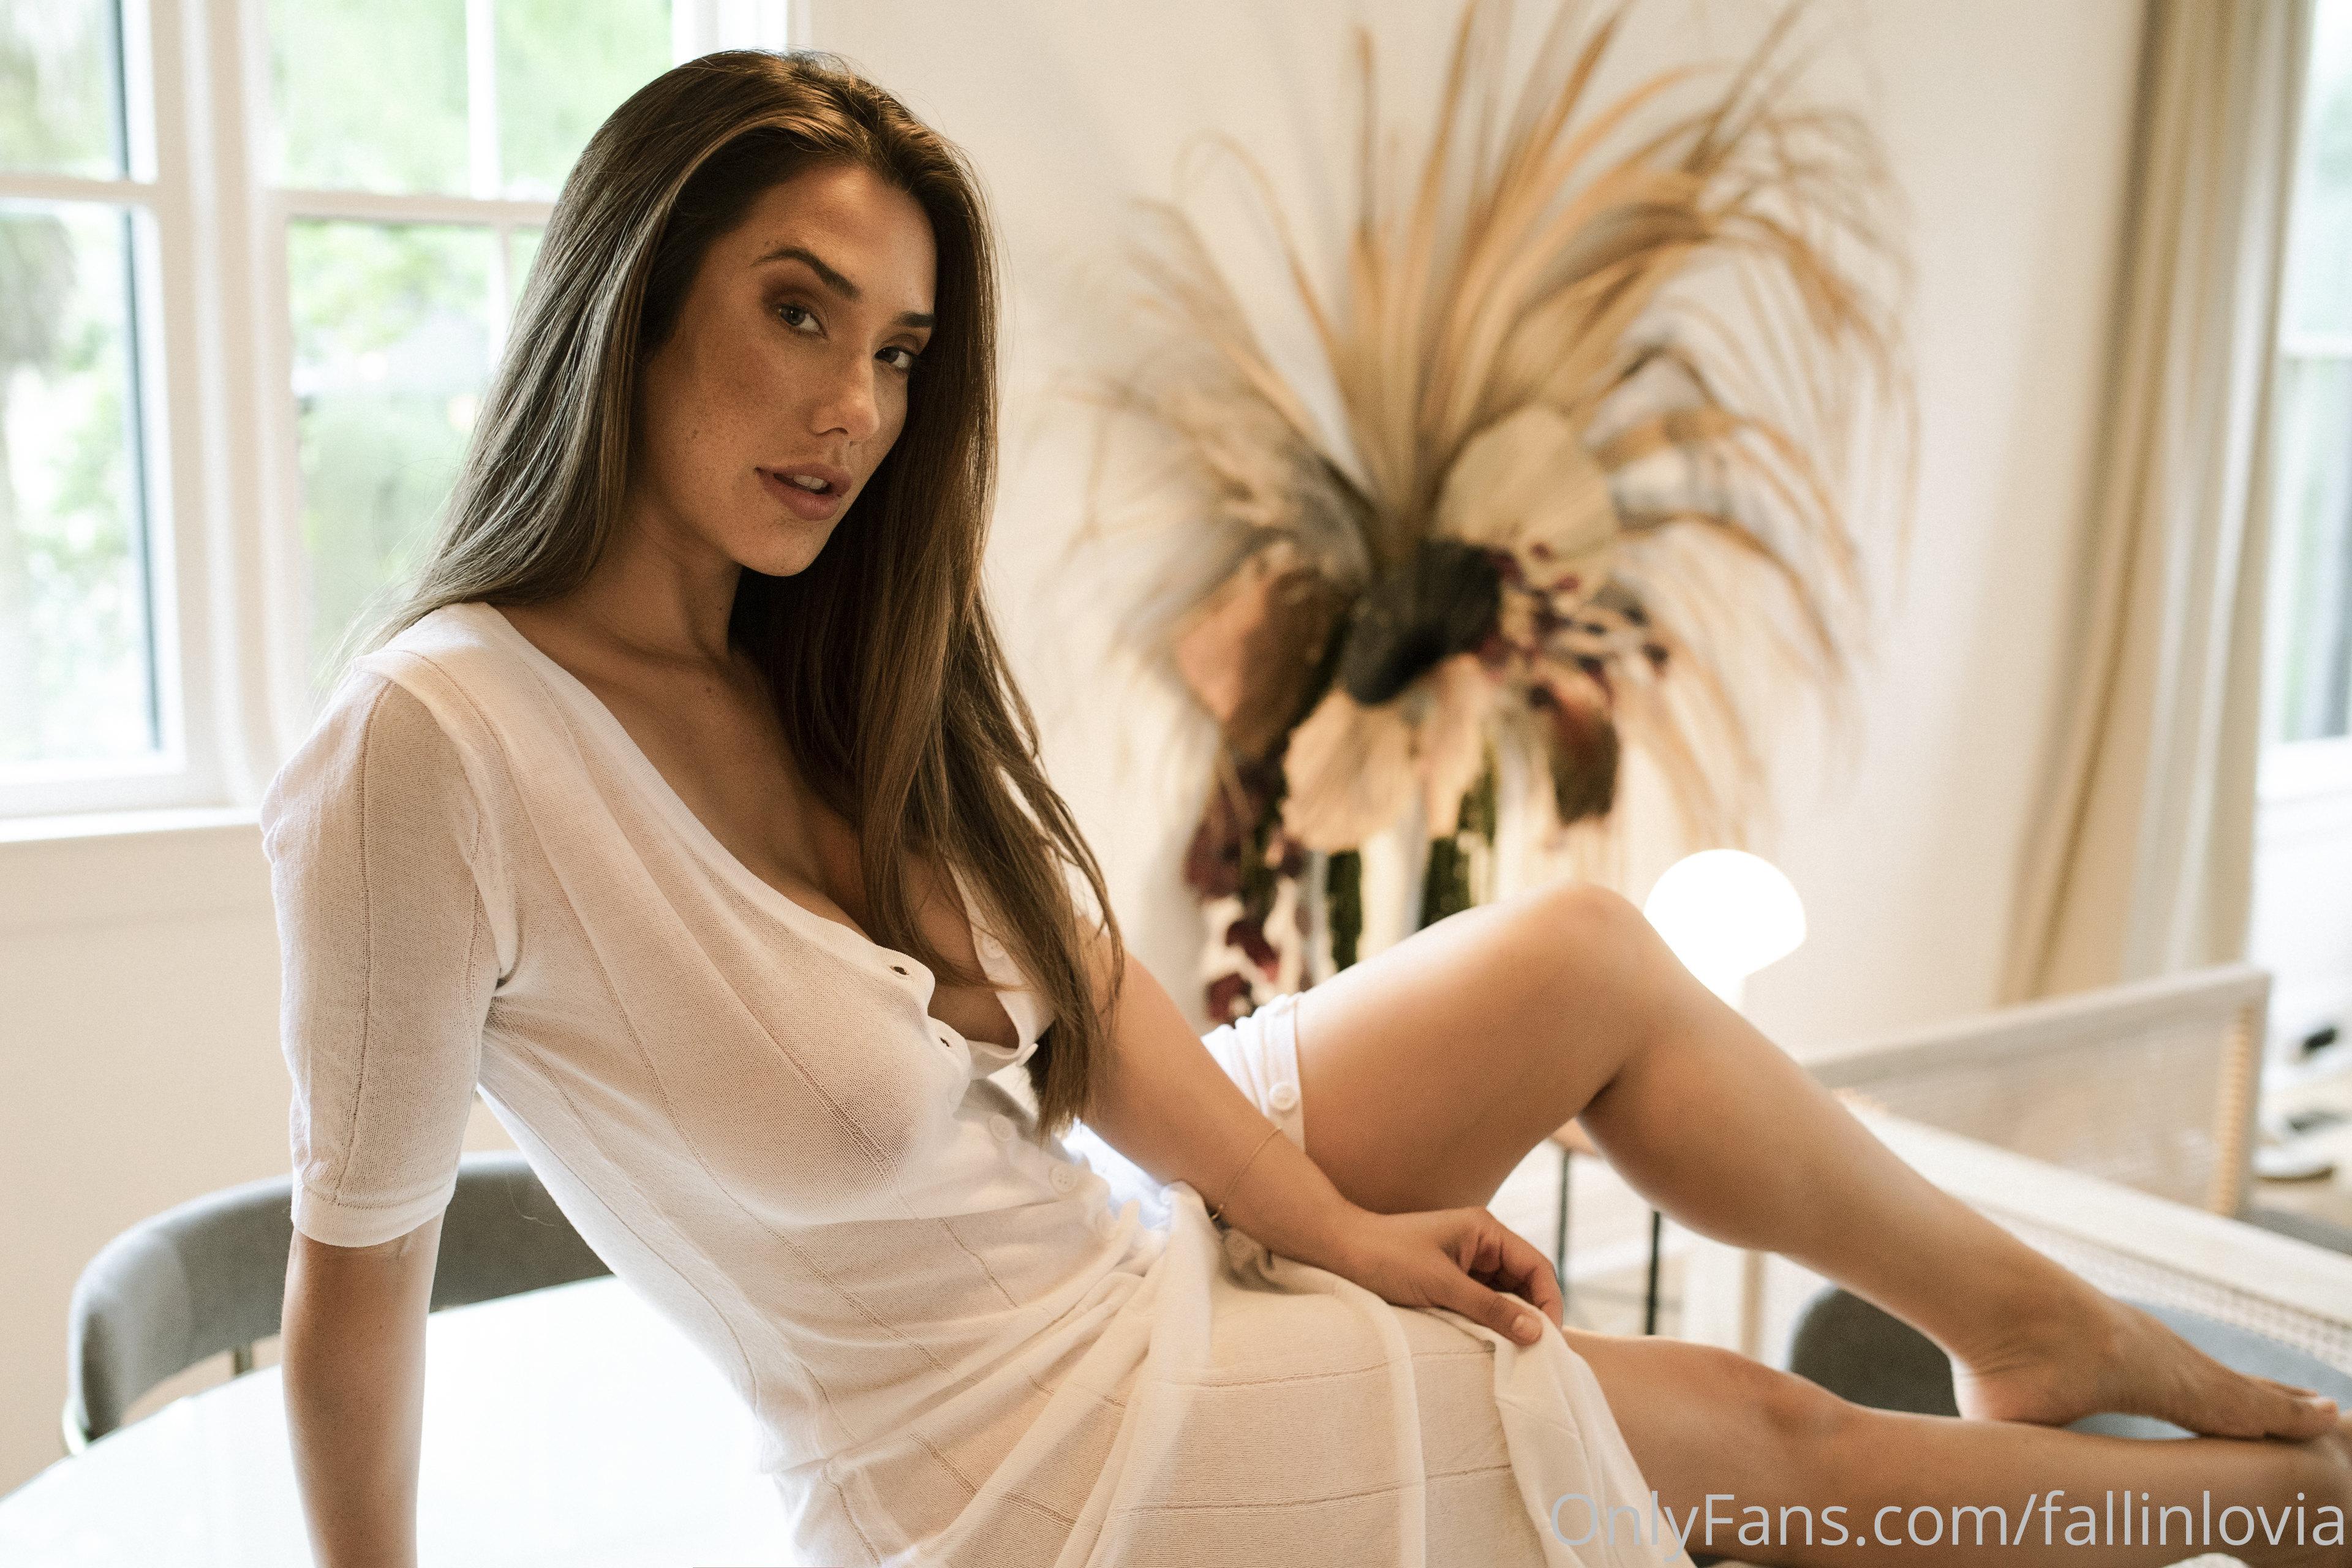 Eva Lovia, Fallinlovia, Onlyfans 0202